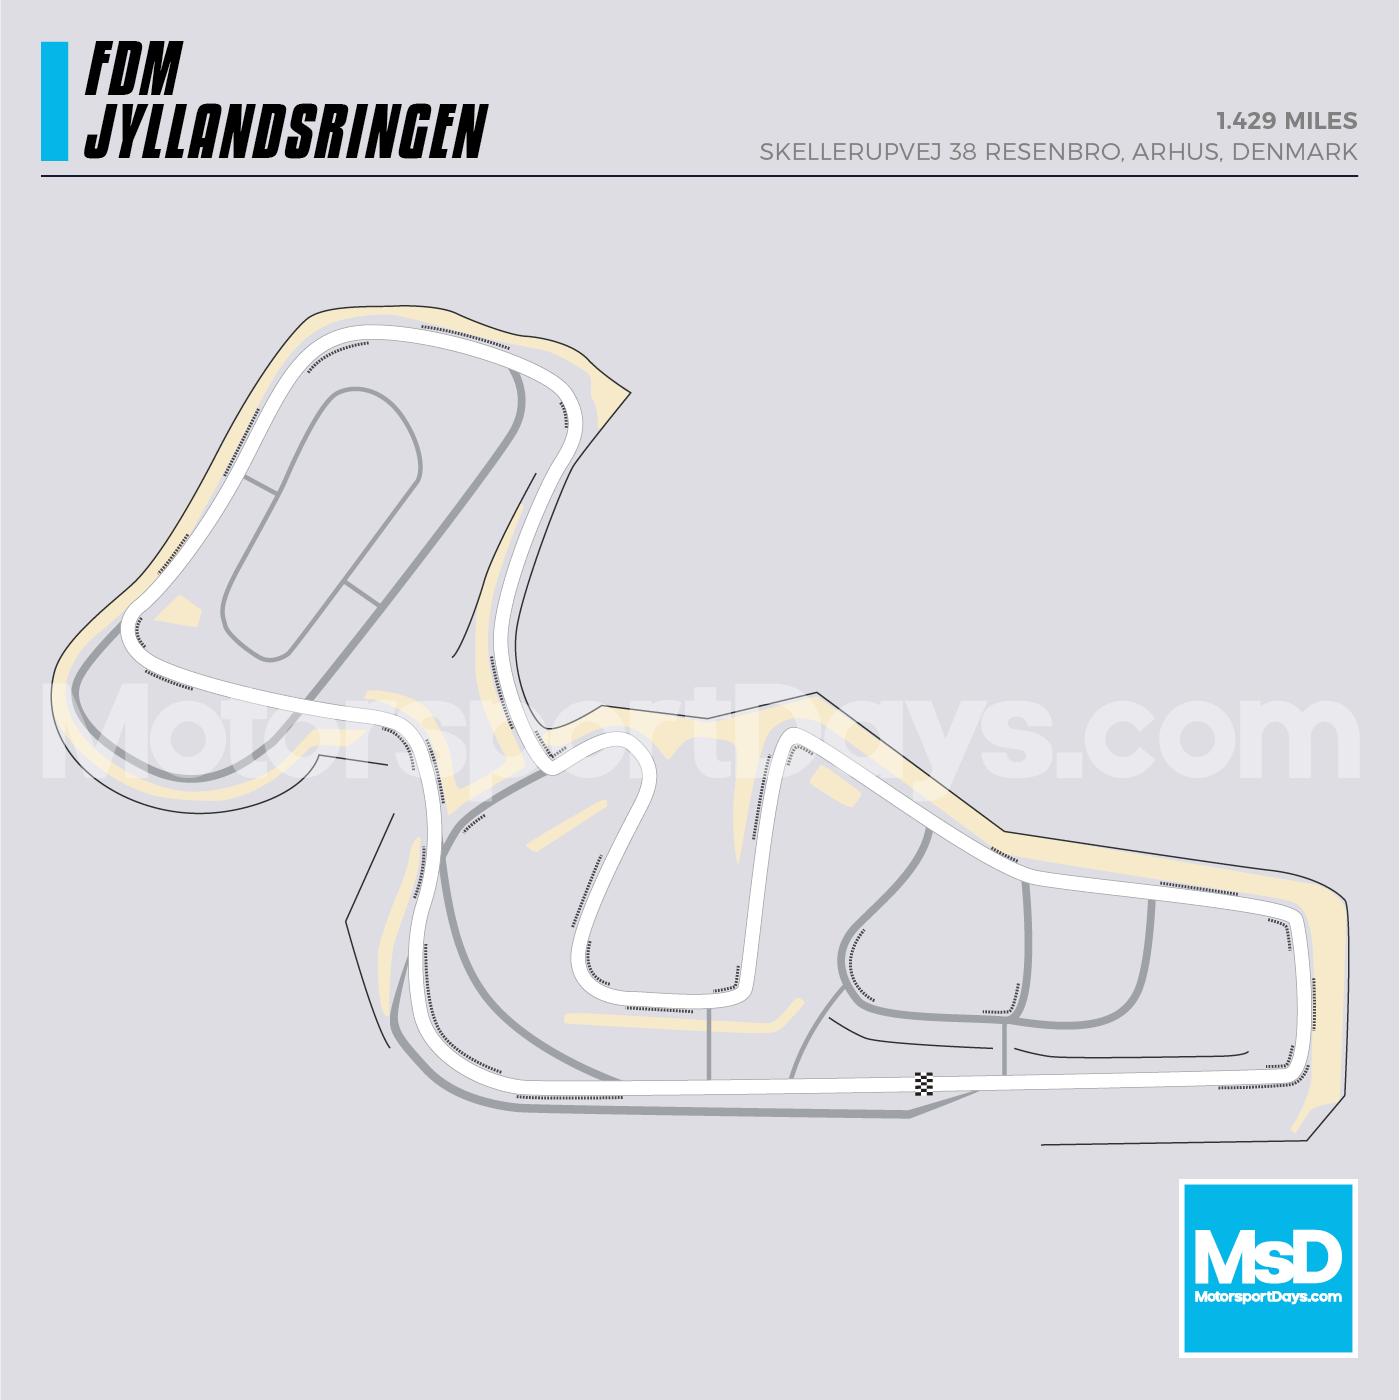 FDM-Jyllandsringen-Circuit-track-map